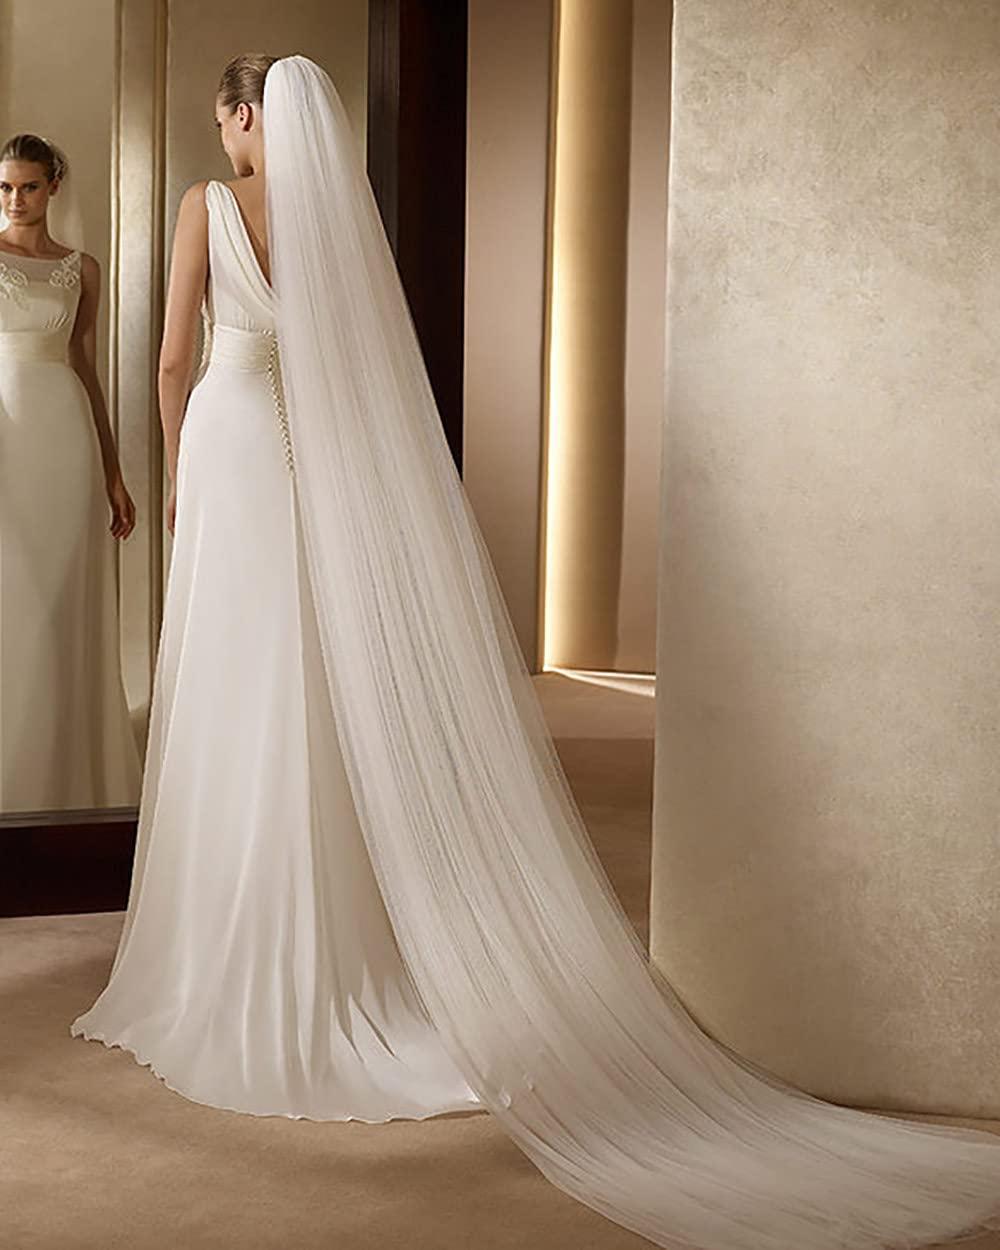 Haraty 2-layer Bridal Veils 118